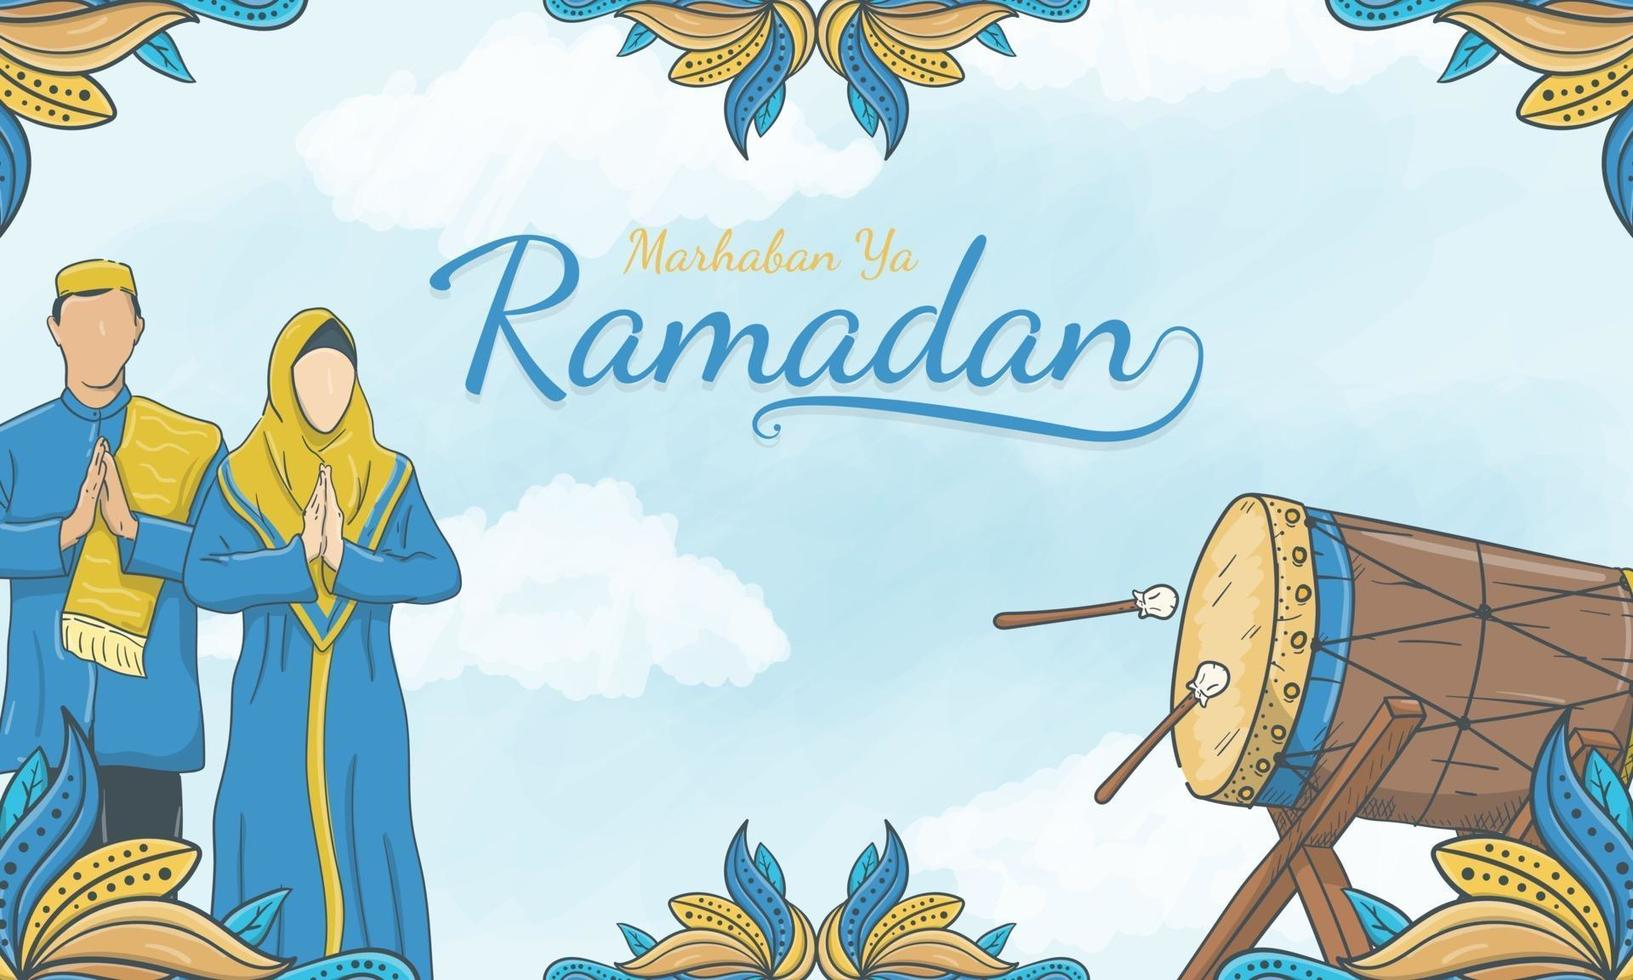 mão desenhada marhaban ya ramadan com ornamento islâmico e caráter muçulmano vetor